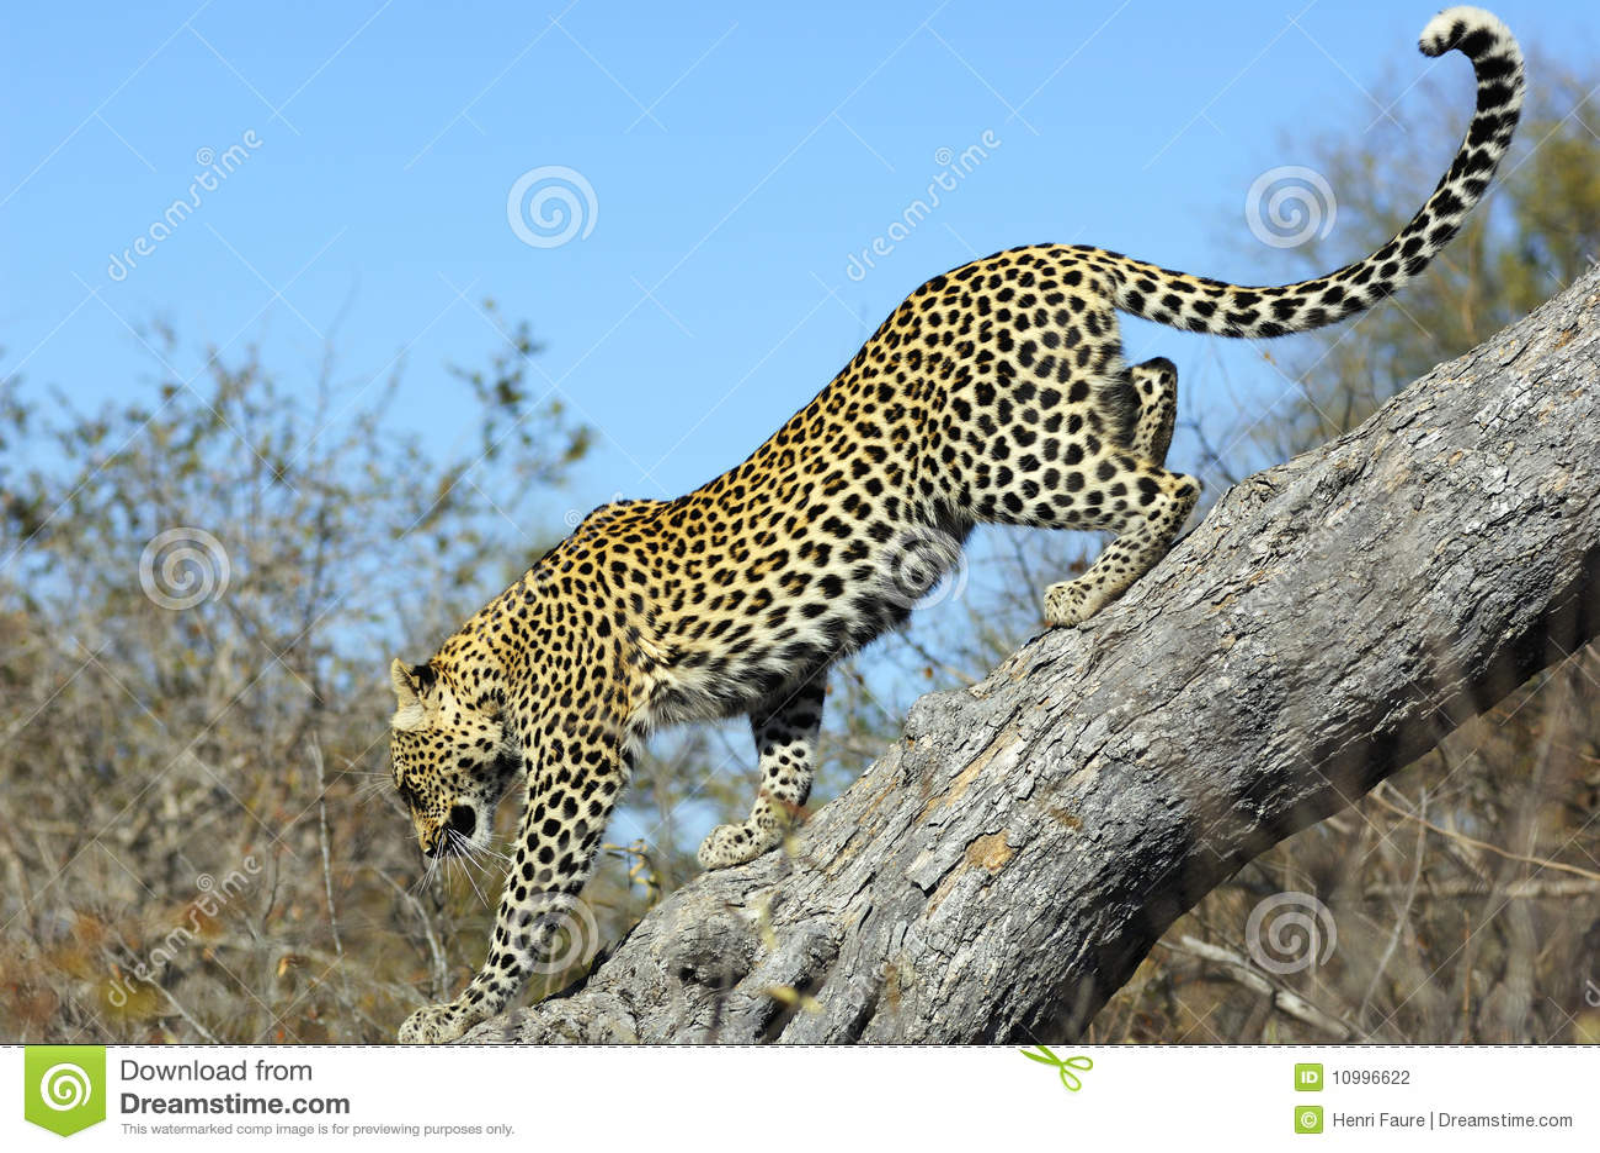 Leopard descending a tree